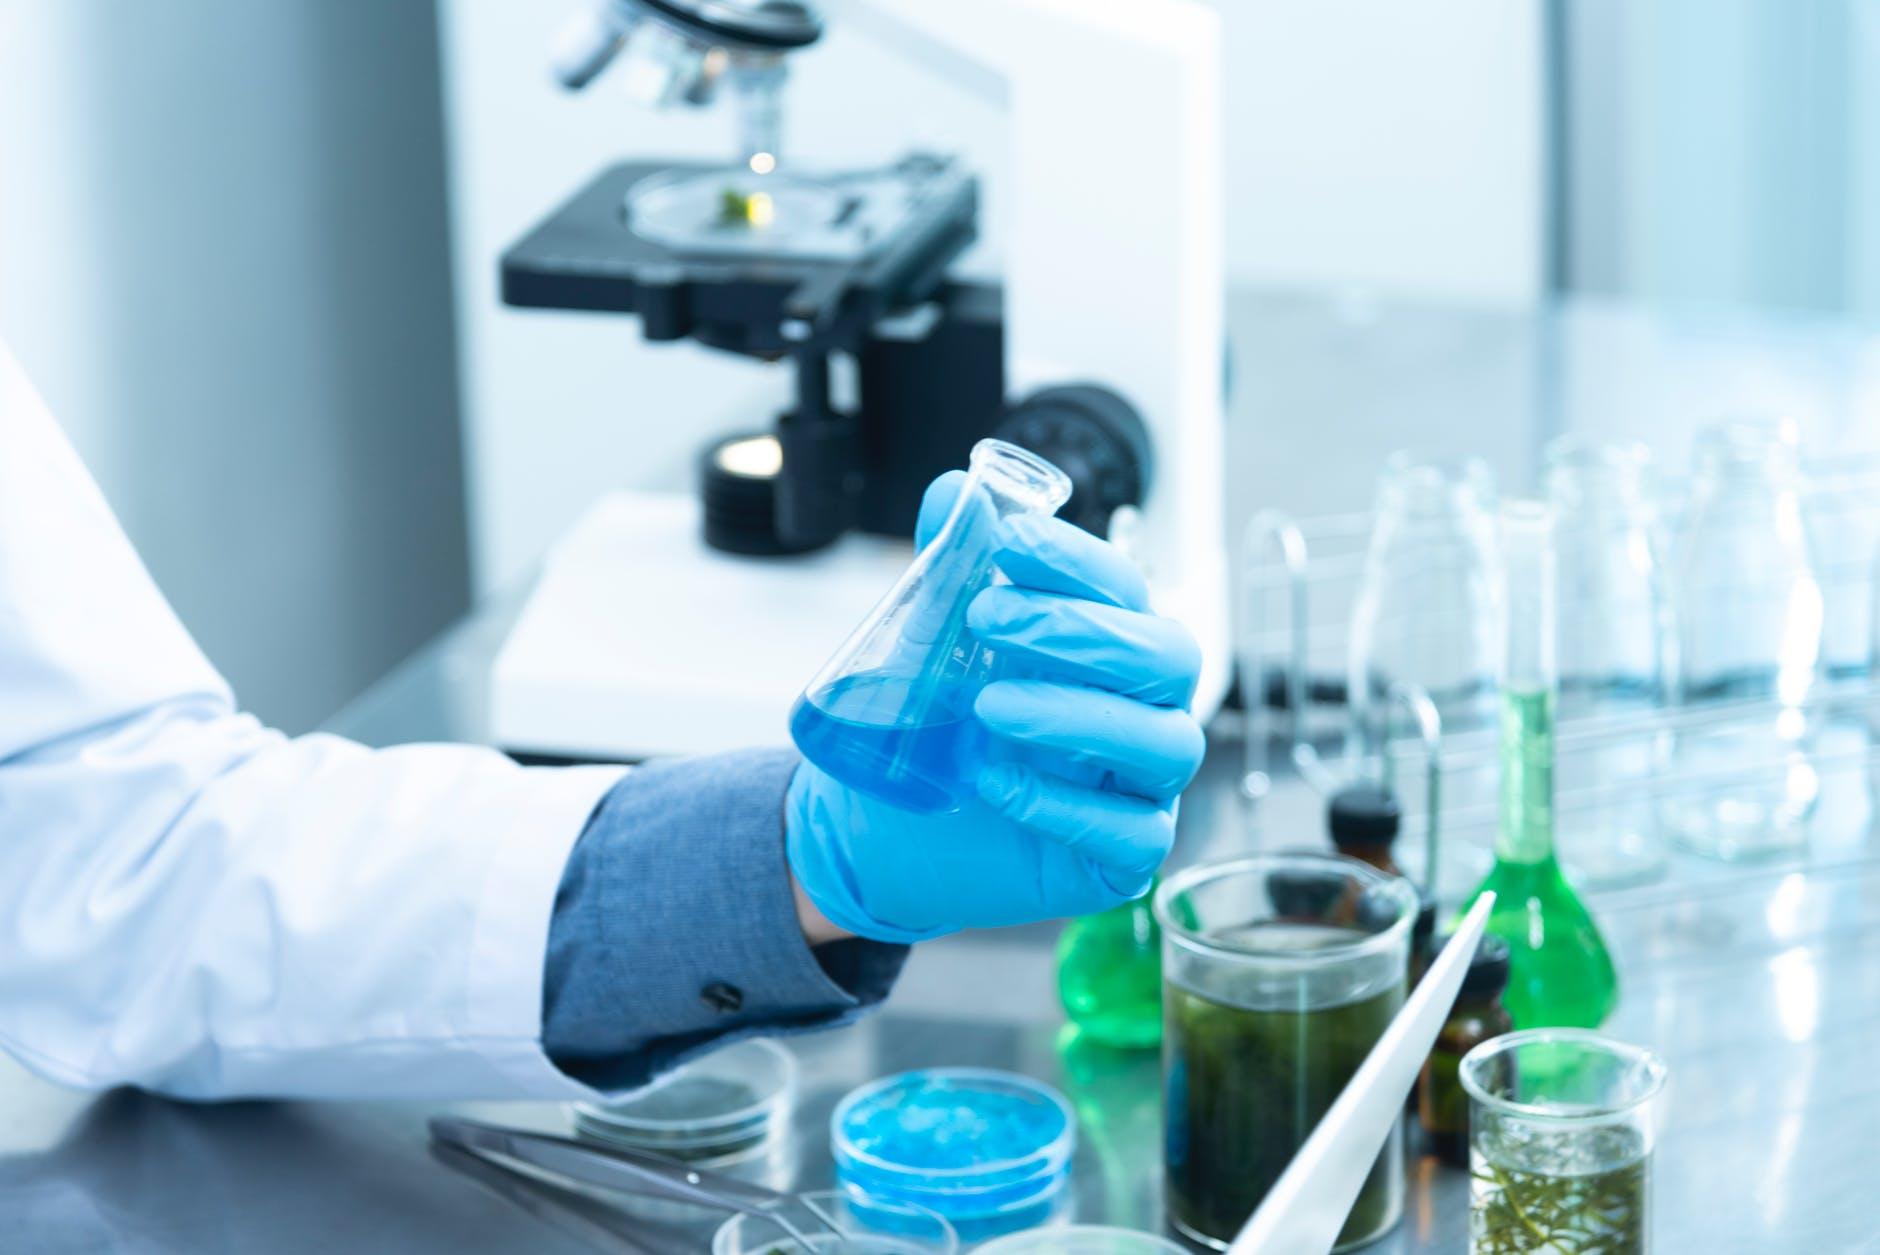 BioCryst (BCRX): Investors are bullish on upcoming FDA ...